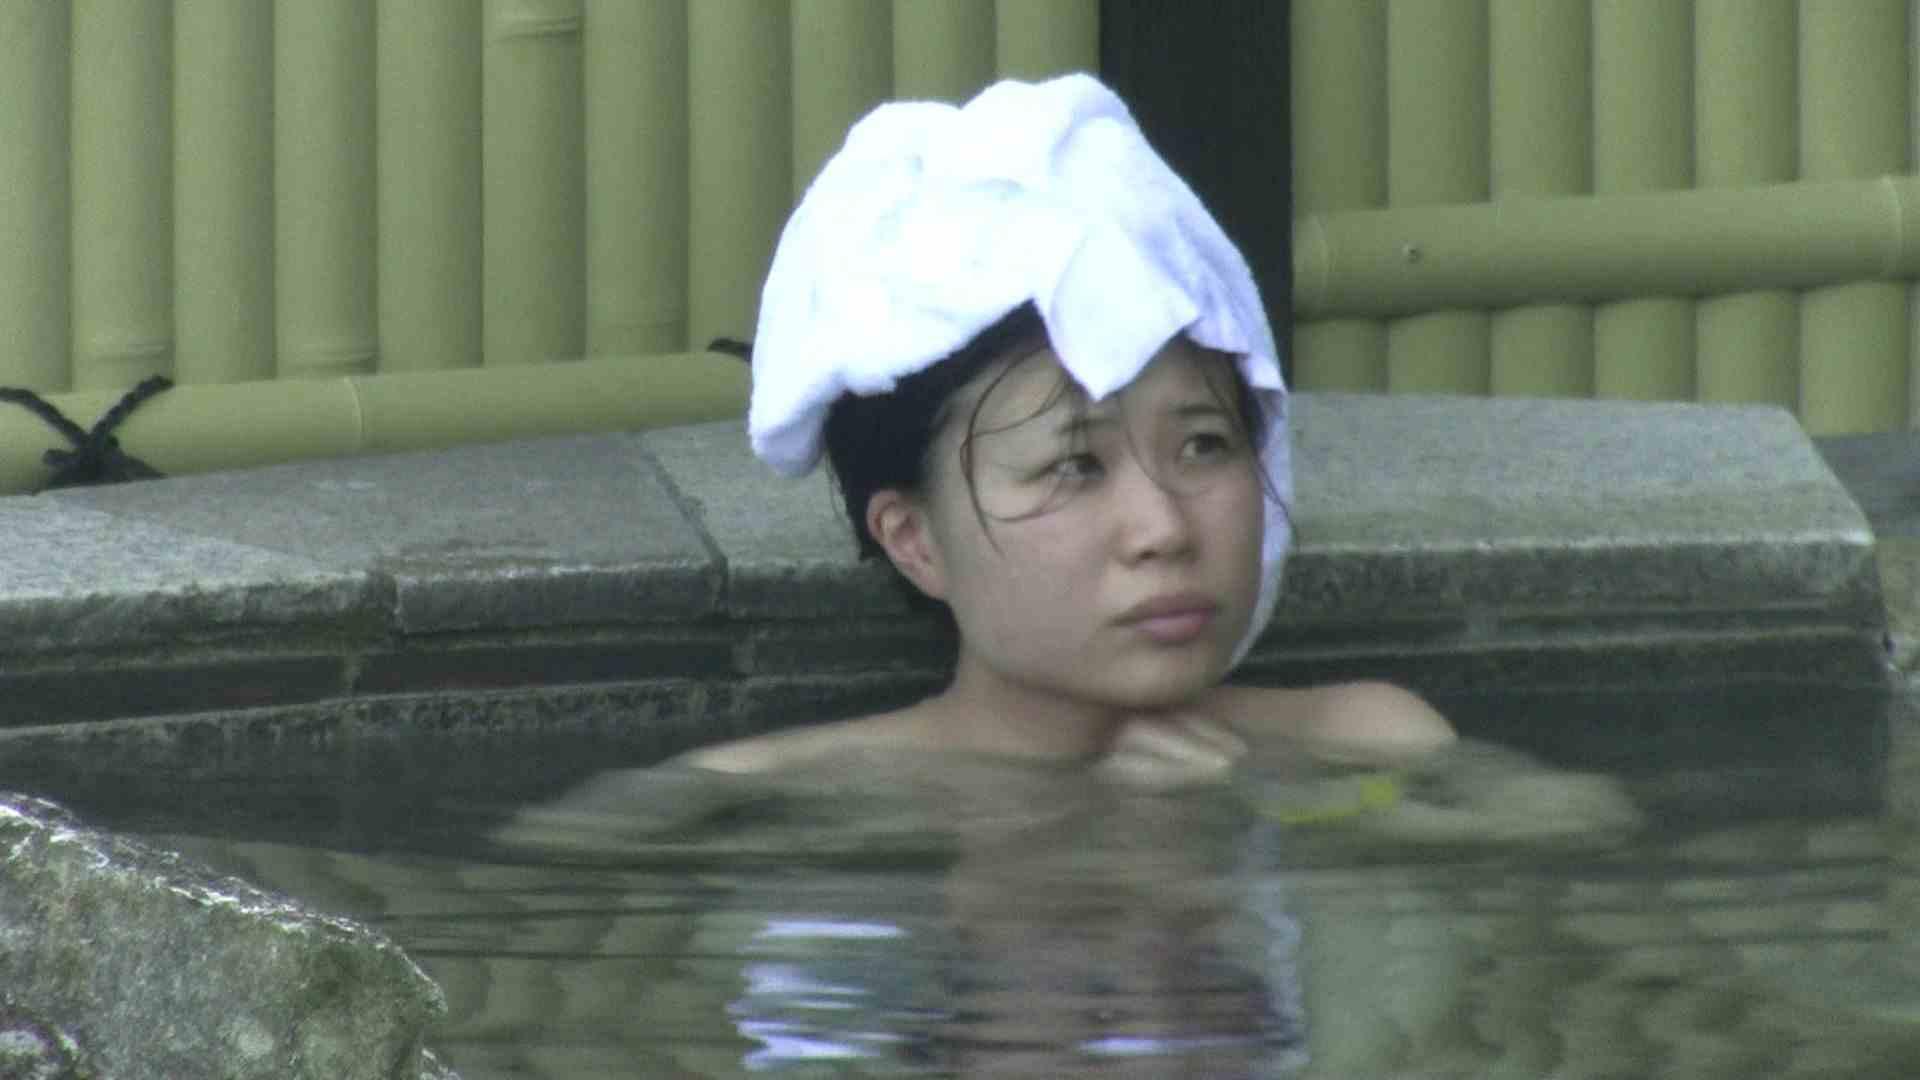 Aquaな露天風呂Vol.183 盗撮 おまんこ無修正動画無料 53枚 38